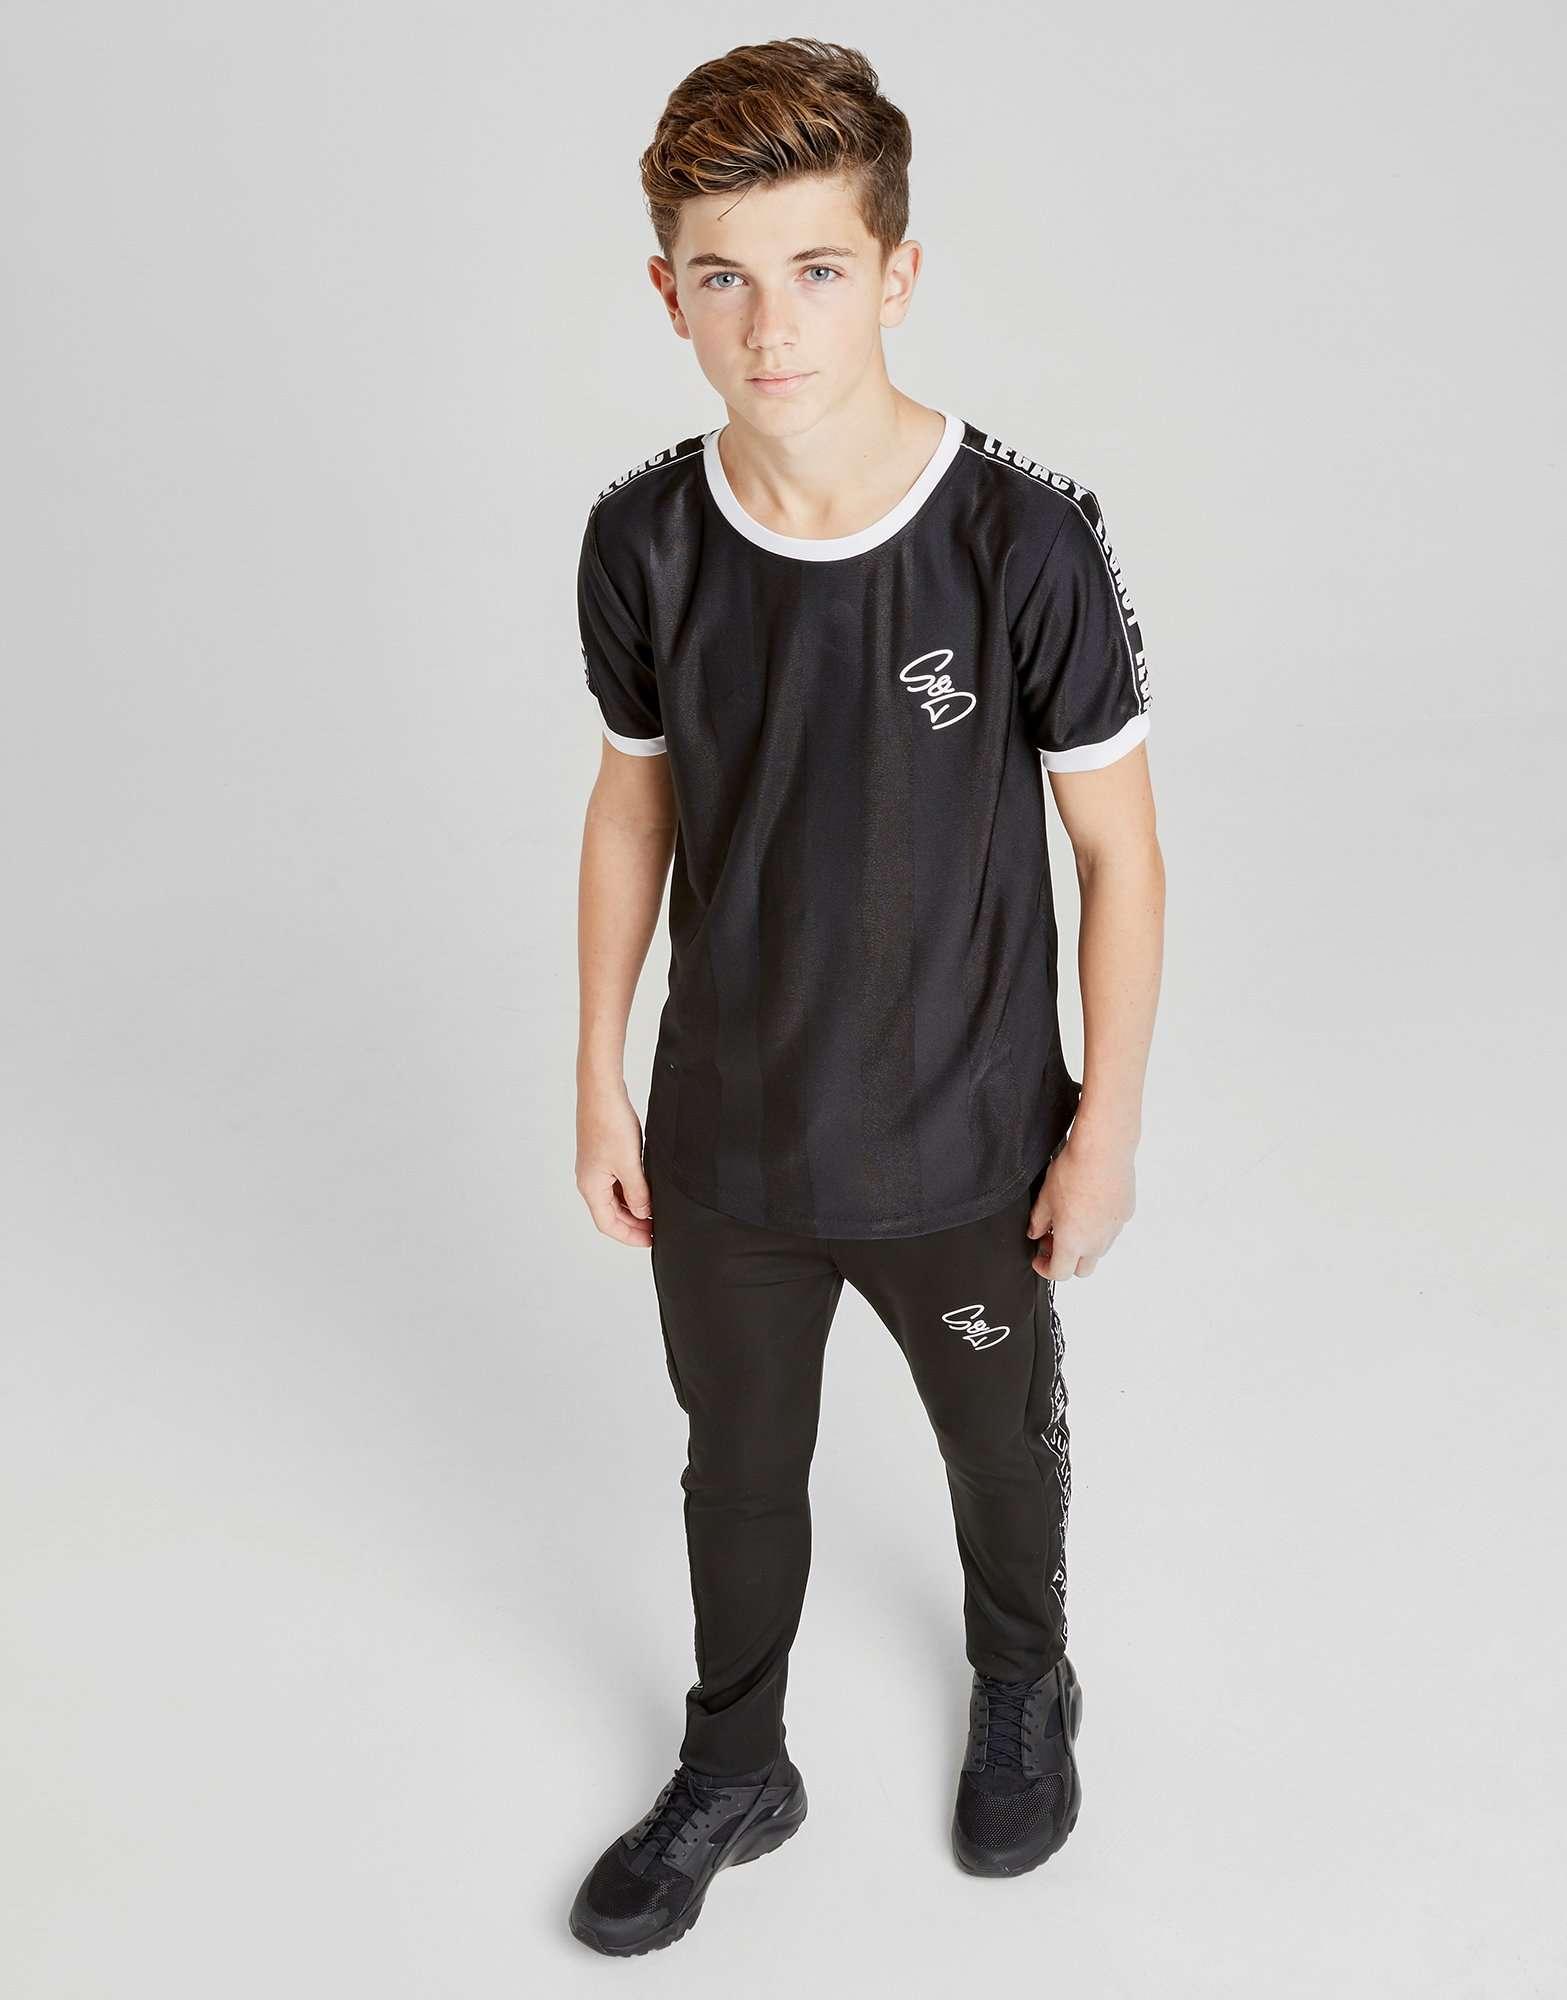 Supply & Demand Zayn Track Pants Junior